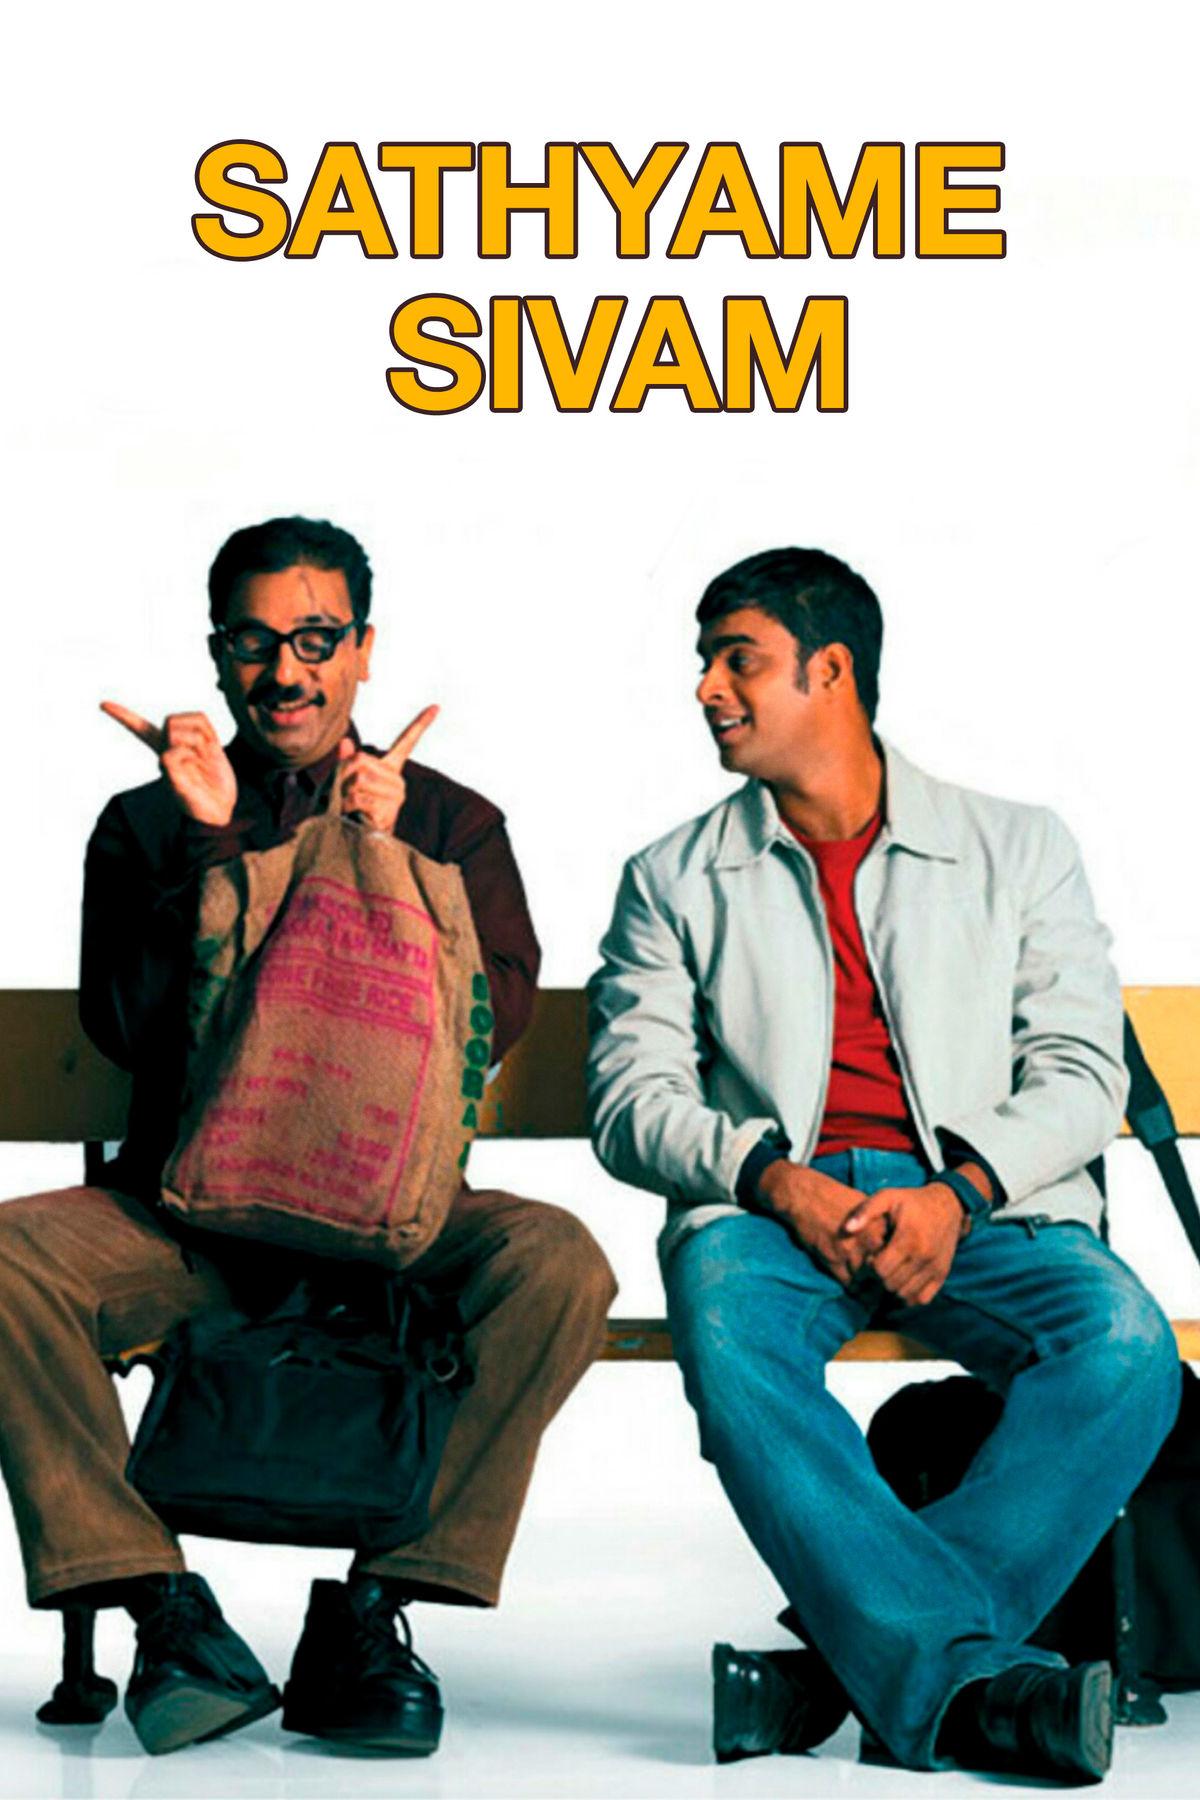 Sathyame Sivam